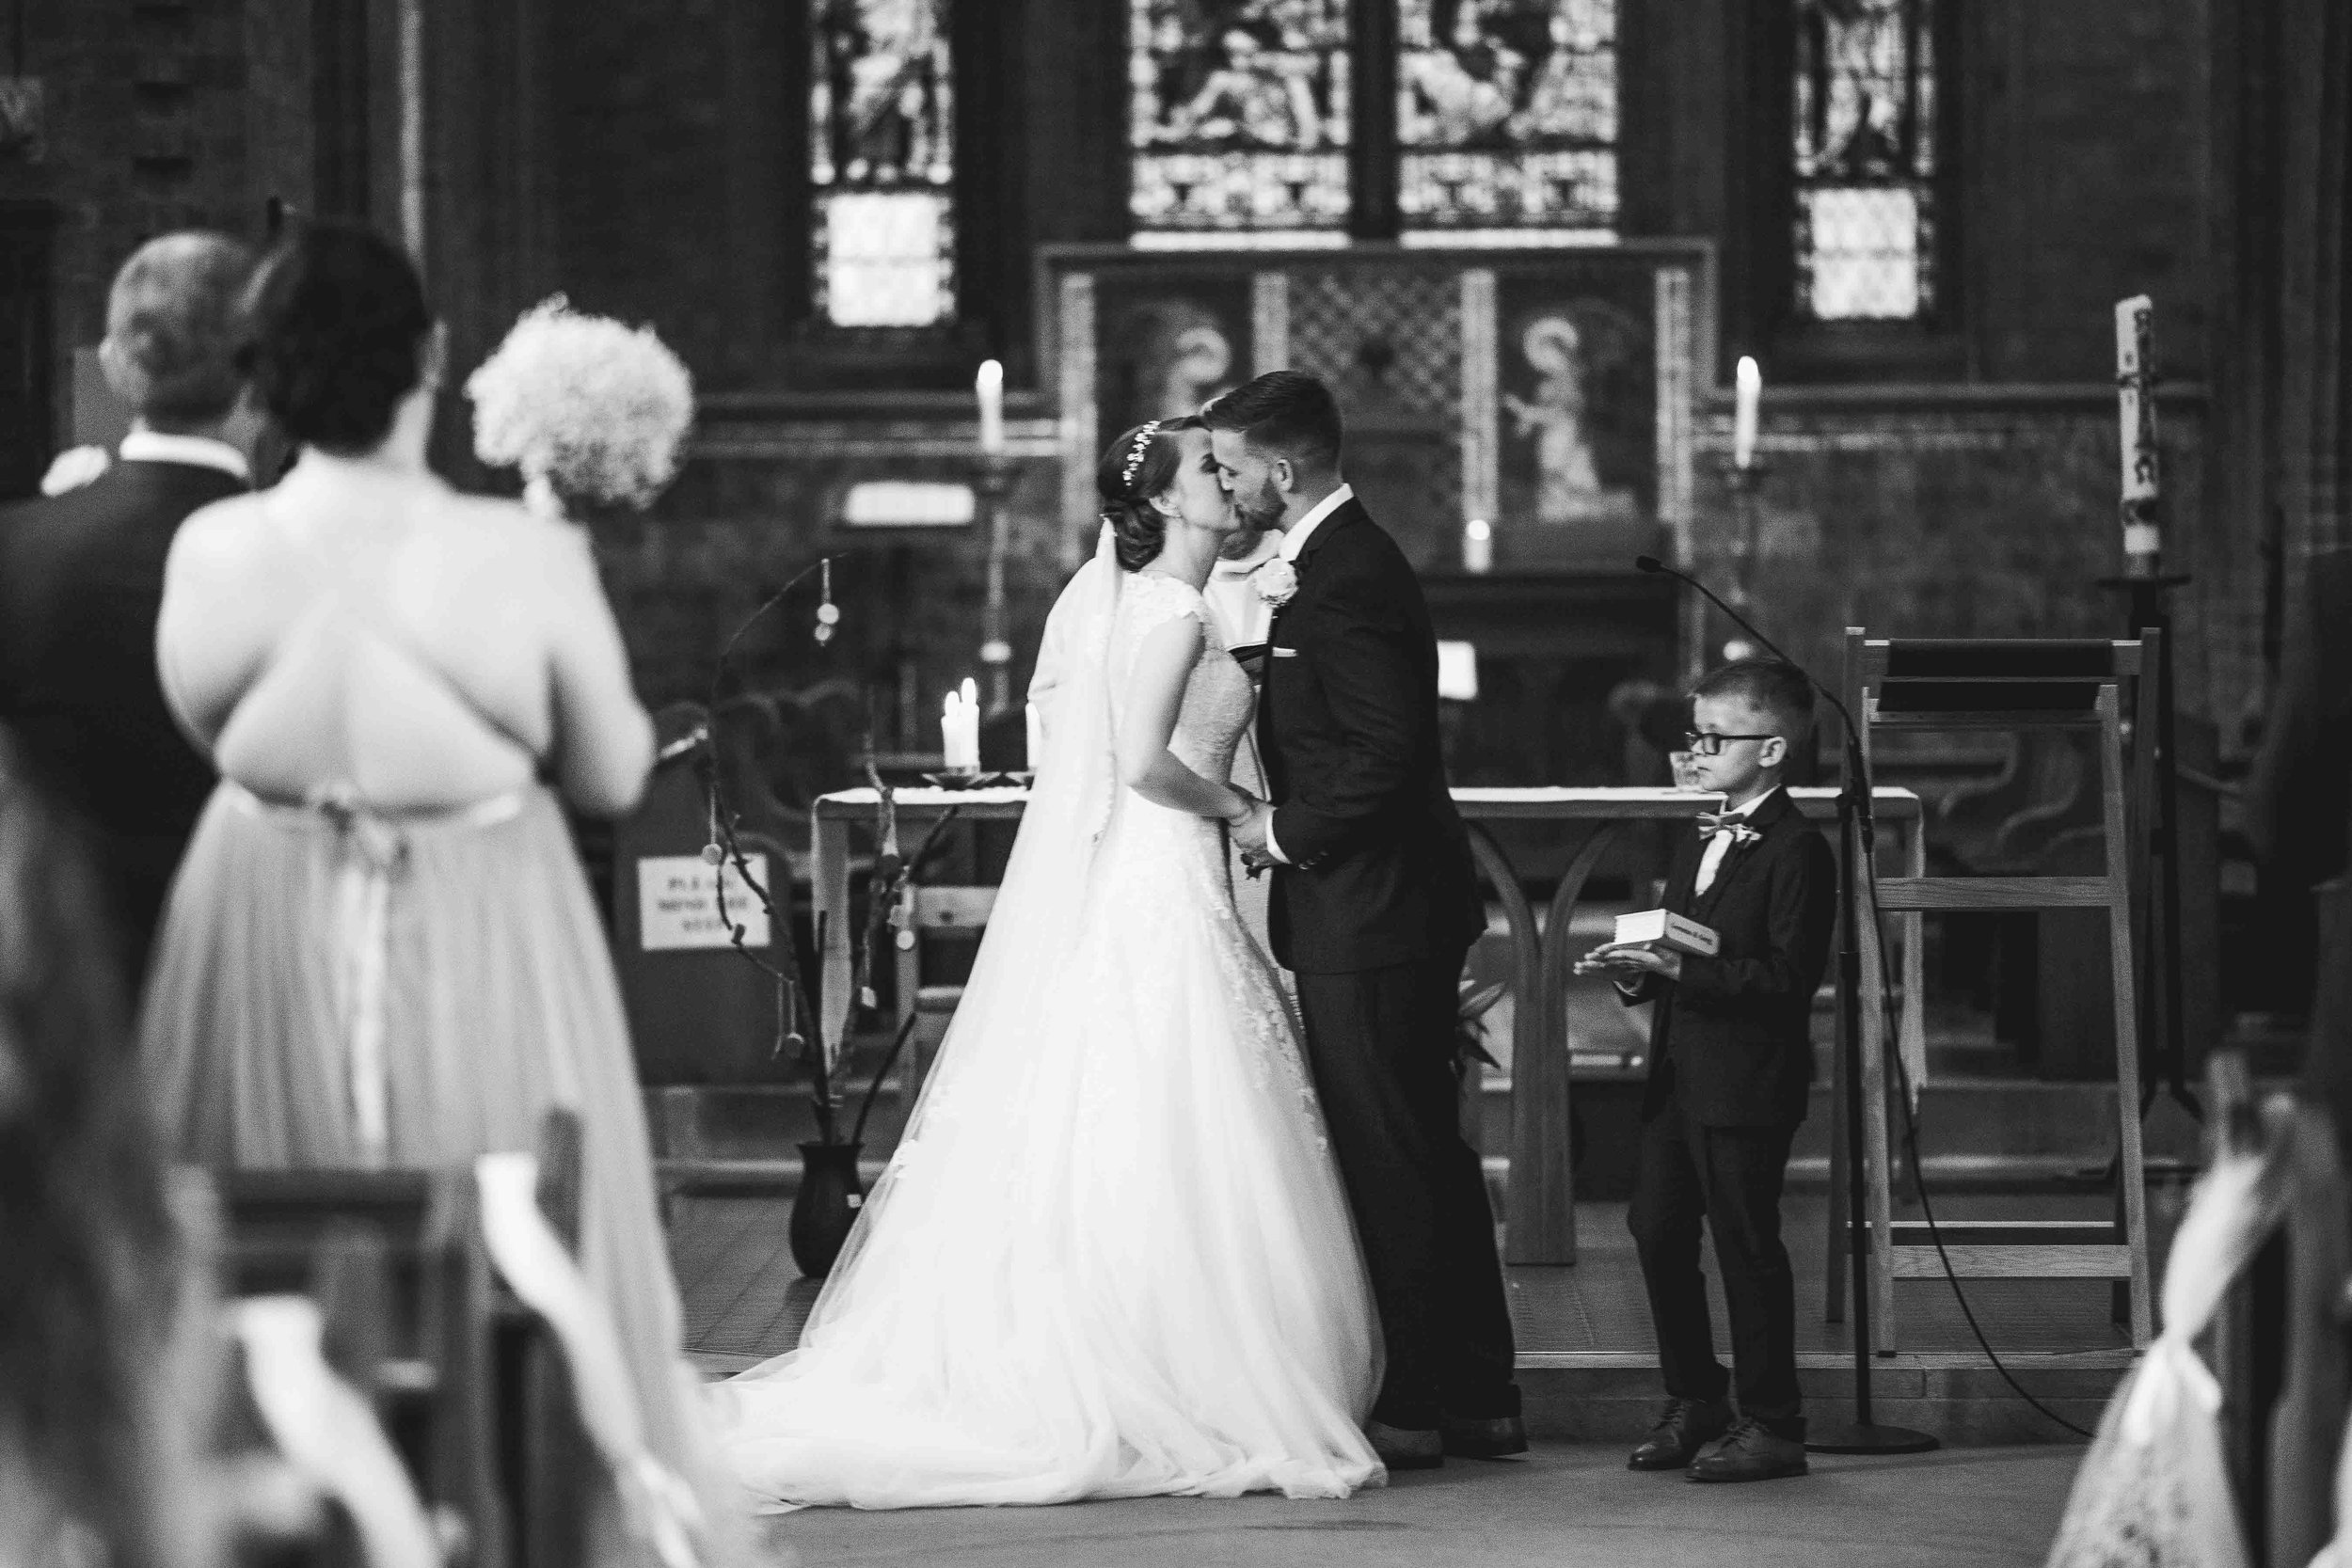 Lea-cooper-photography-willenhall-wolverhampton-wedding-photographer-birmingham-shirley-west-midlands-ceremony-church-10.JPG